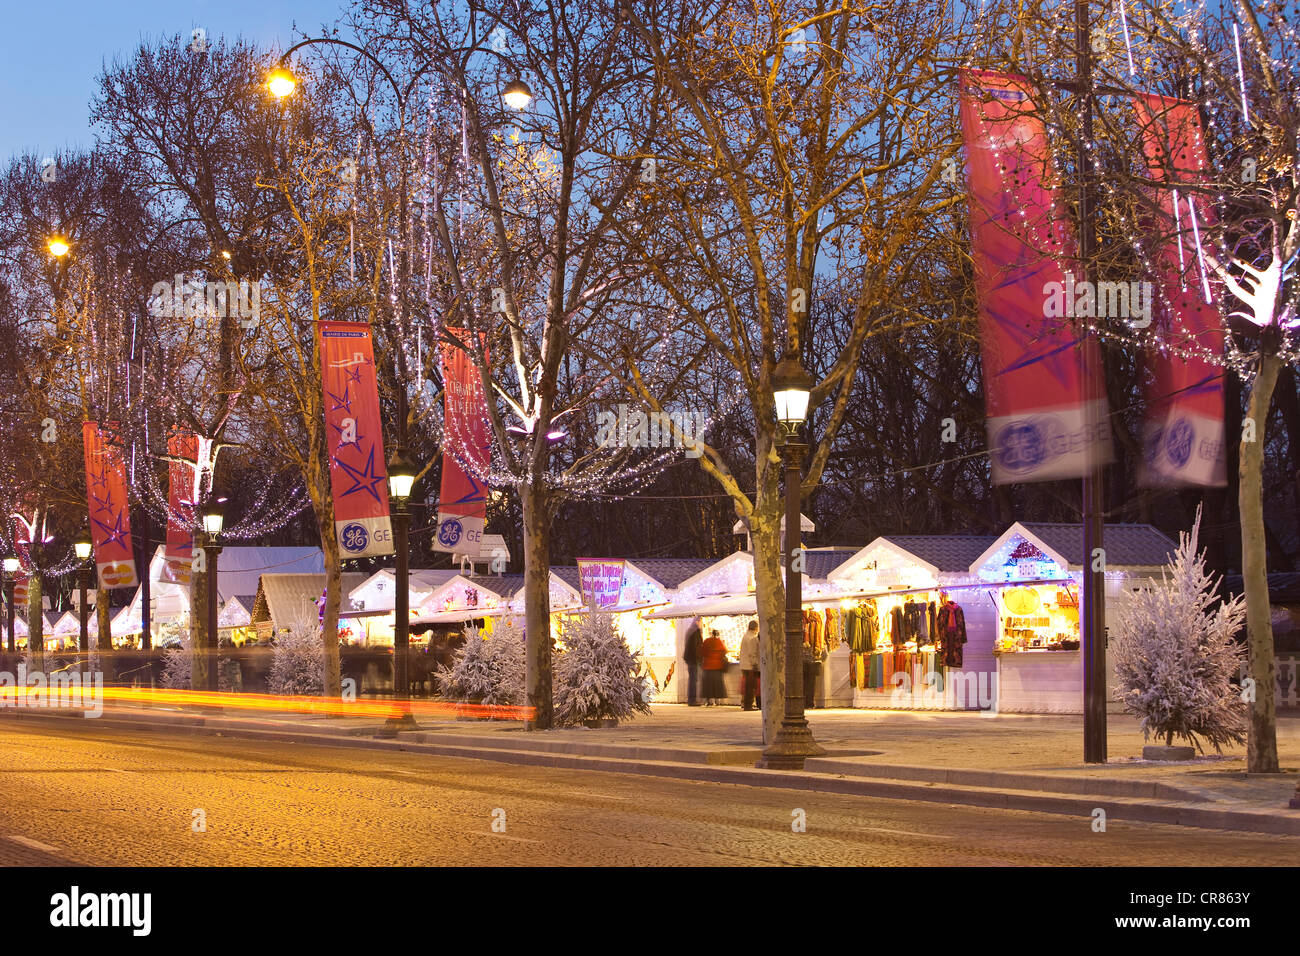 france paris the christmas market on the avenue des champs elysees stock image